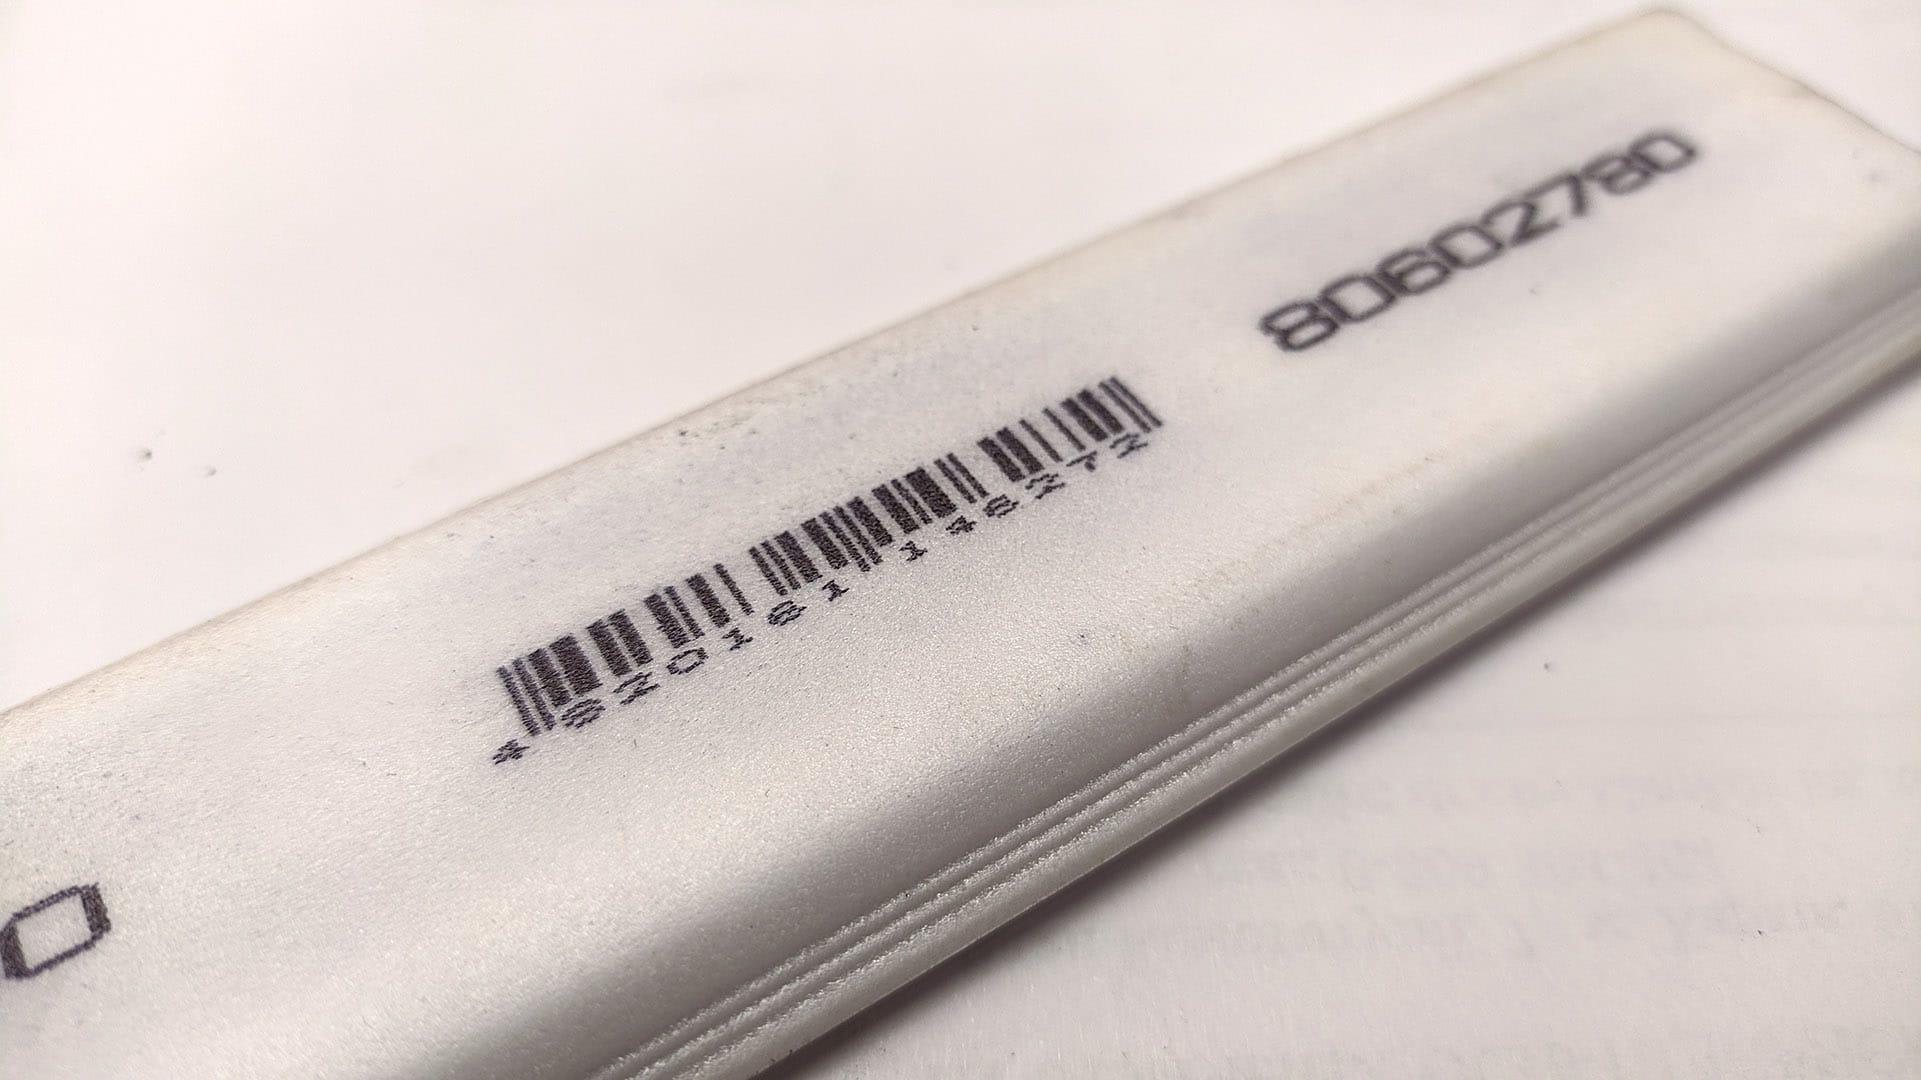 Каплеструйный маркиратор Willett 405 пример печати штрих-кода